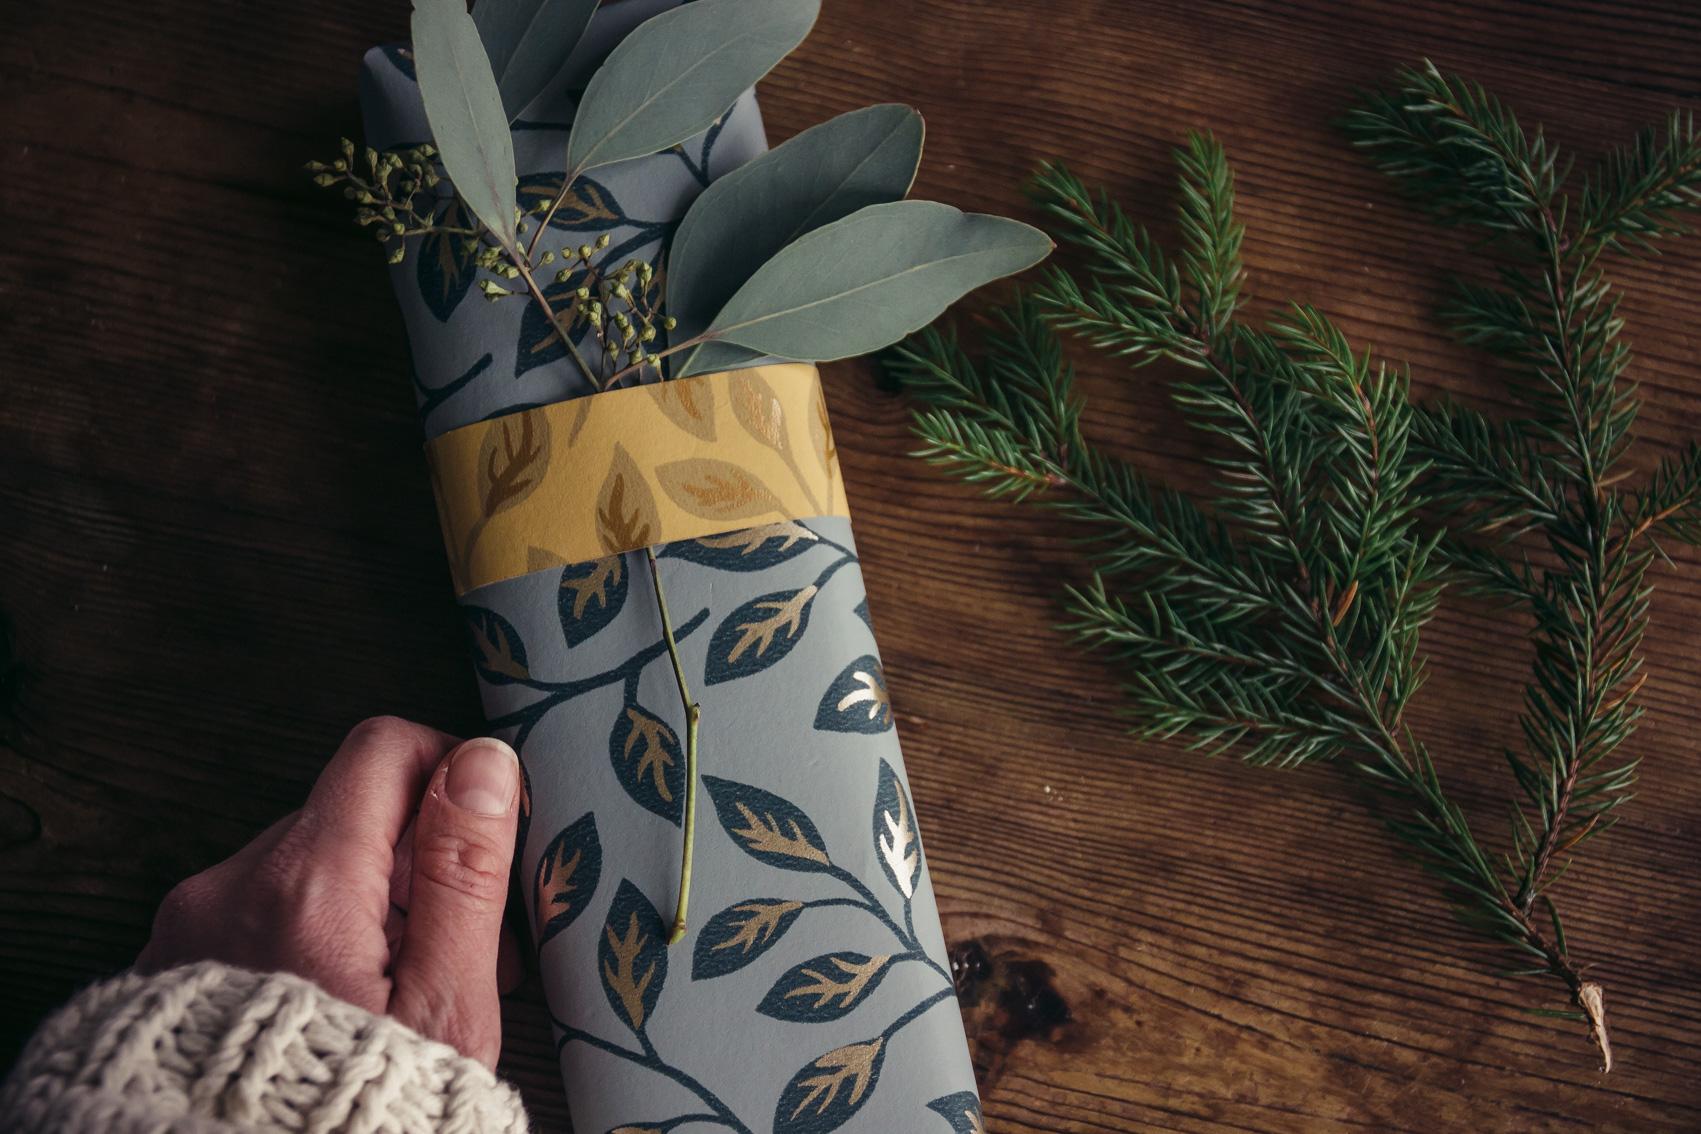 paketinslagning julklapp apelkvist midbec tapeter